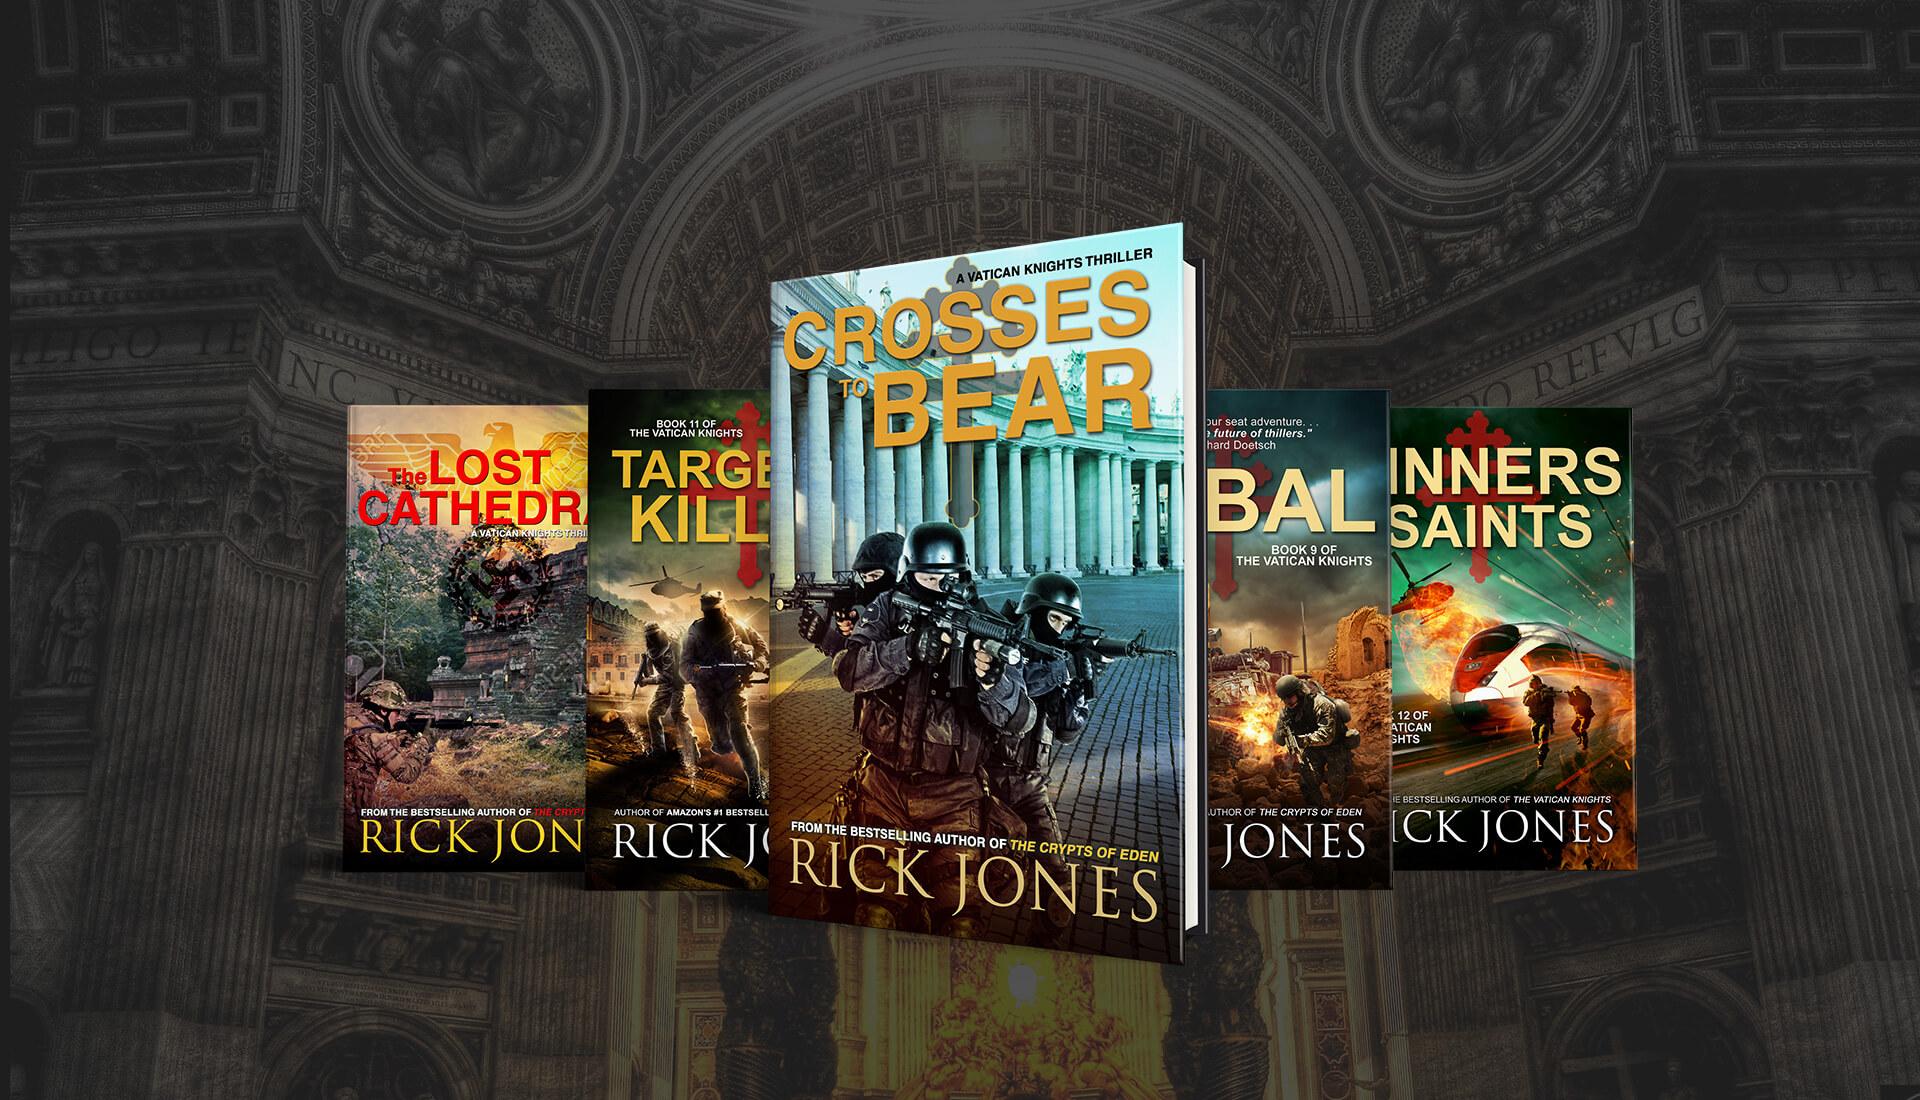 Rick Jones